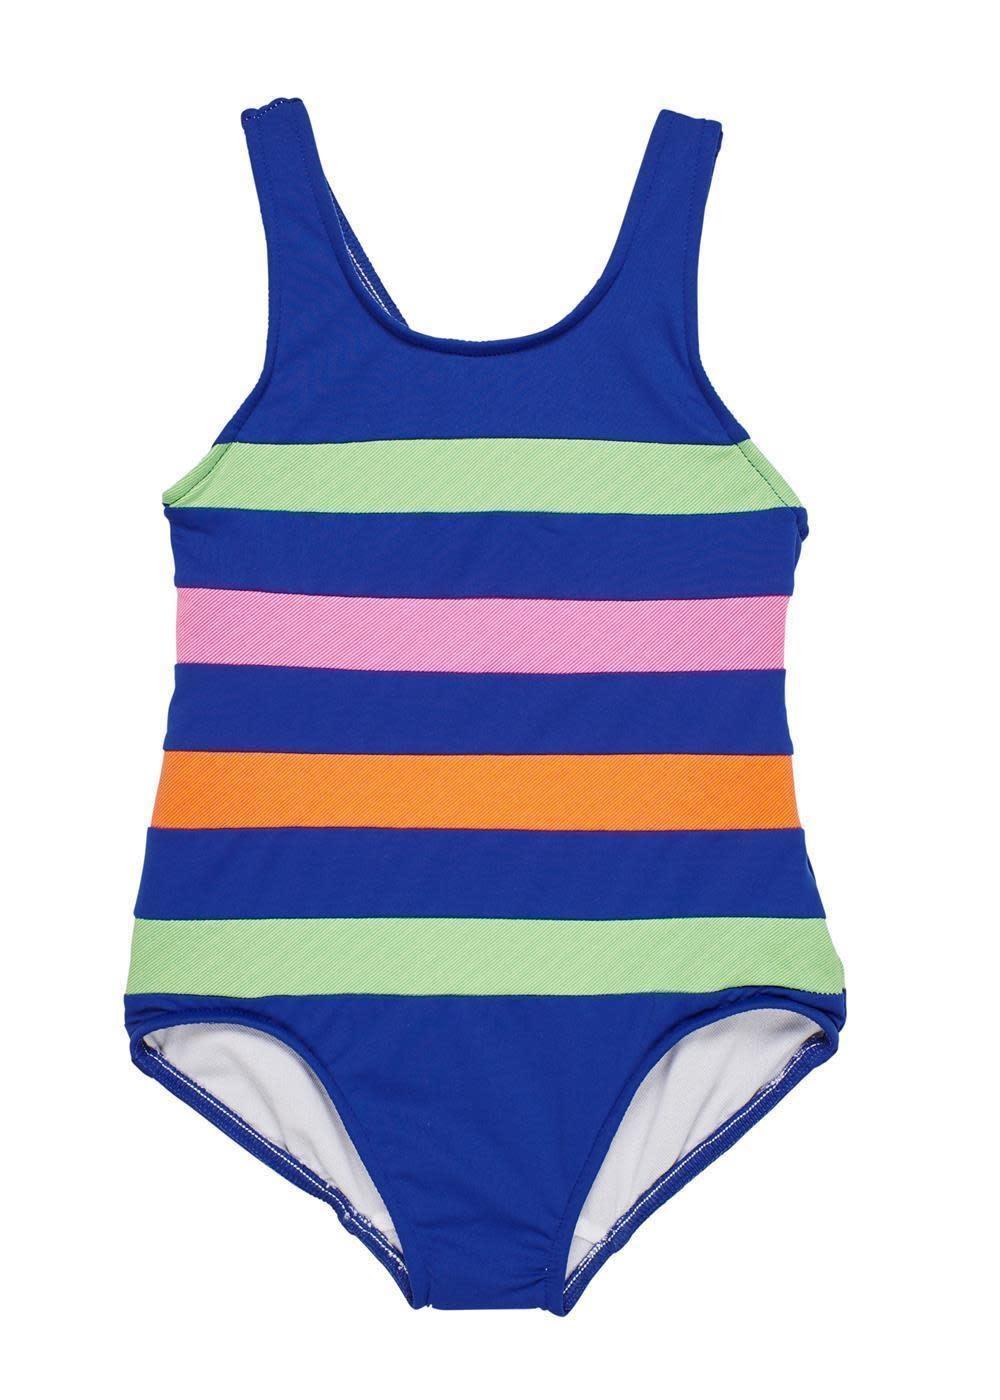 Florence Eiseman Navy Color Block Swimsuit